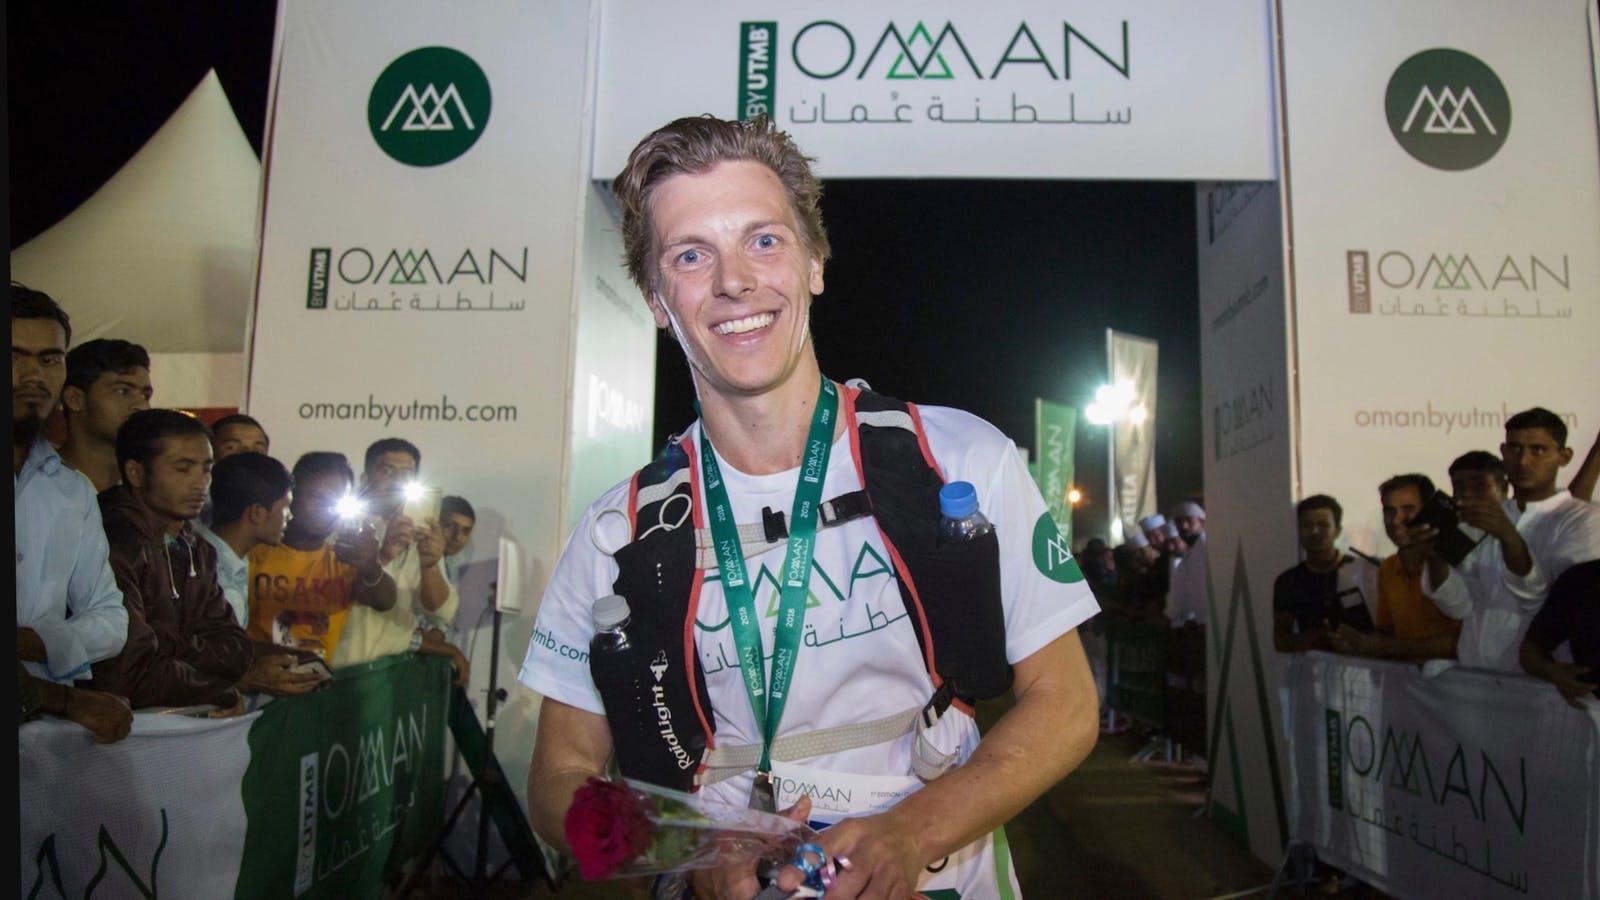 Fett som bränsle i ultramaraton